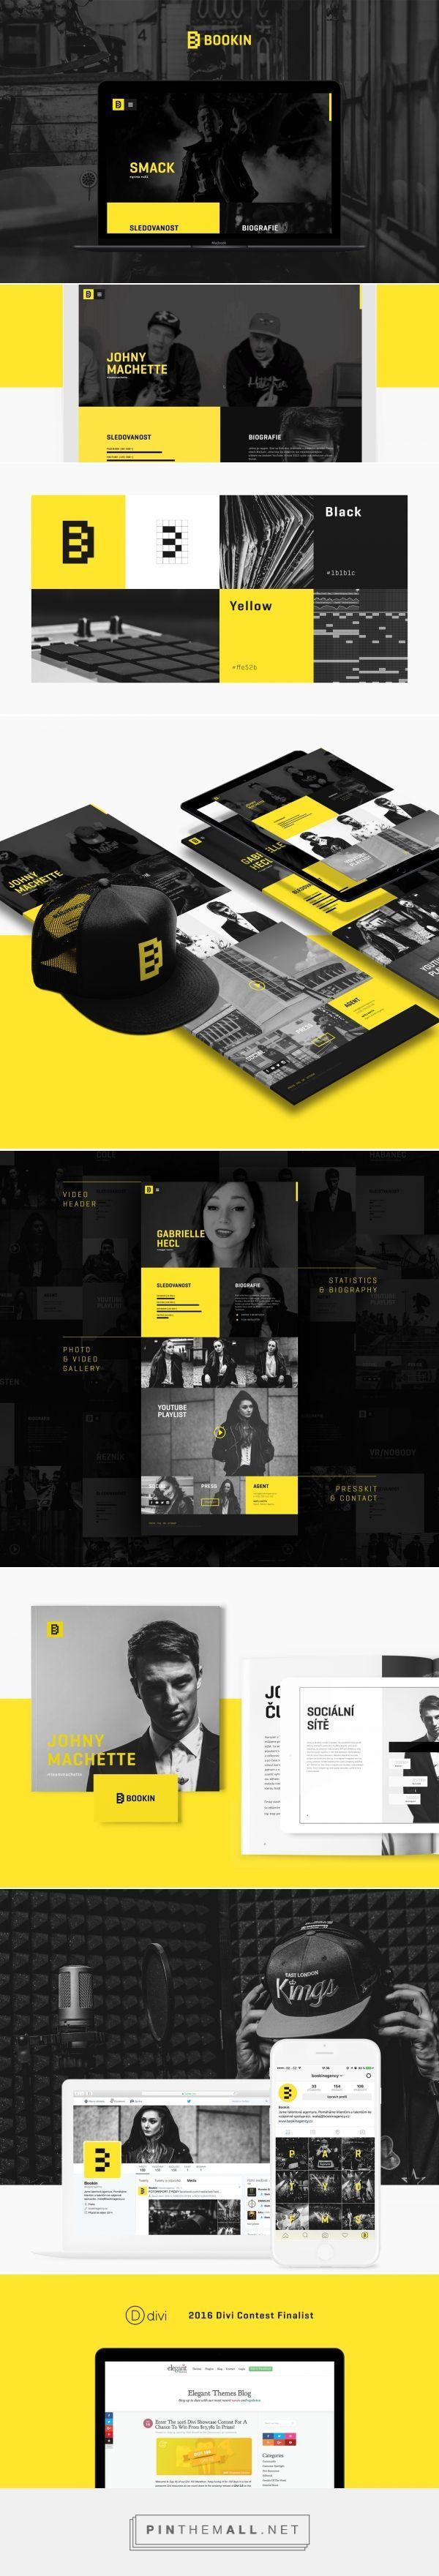 Bookin Agency Web Design by Robin Remsa | Fivestar Branding Agency – Design and Branding Agency & Curated Inspiration Gallery